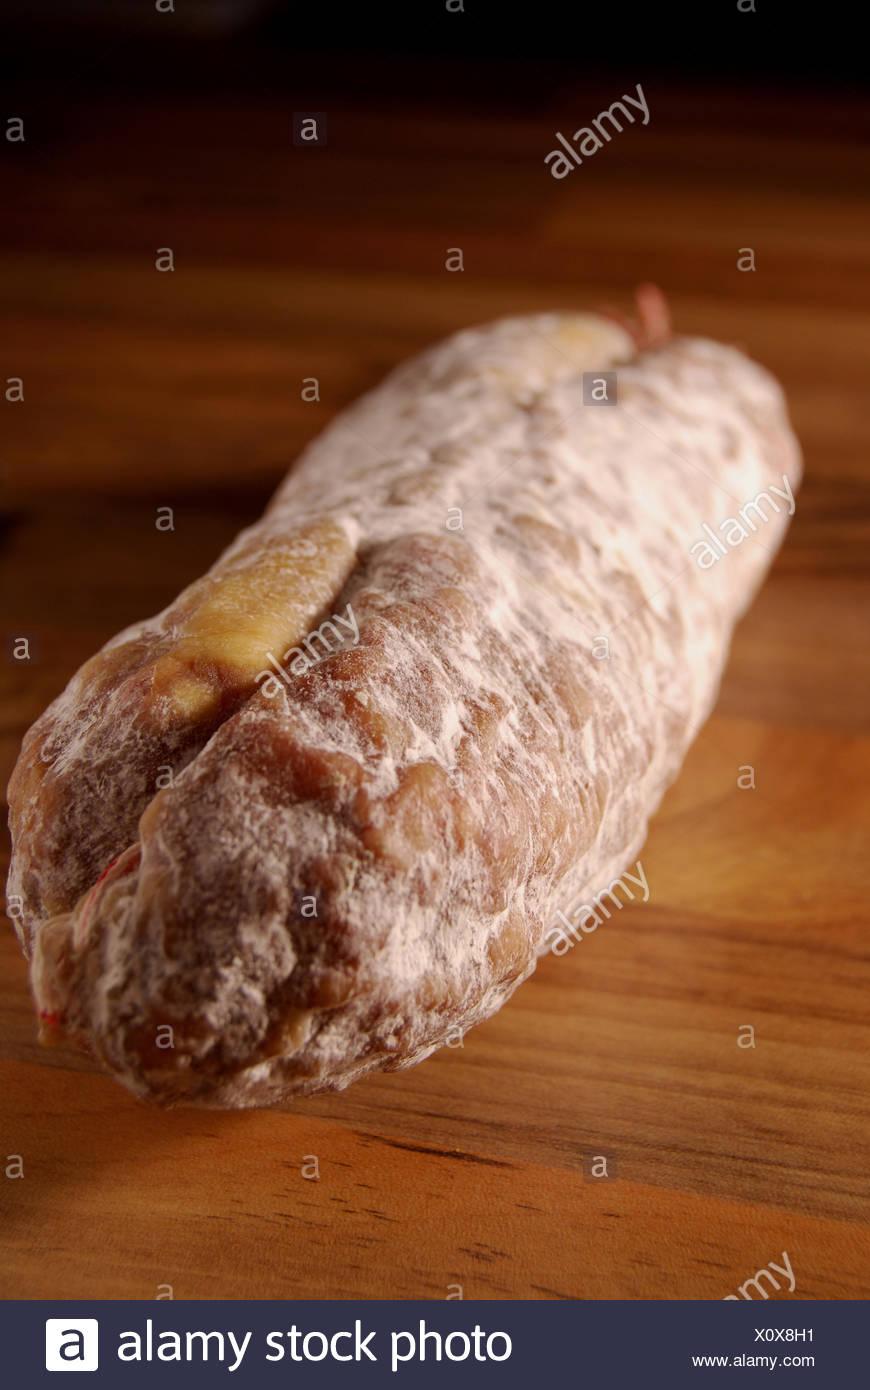 Whole uncut salami - Stock Image